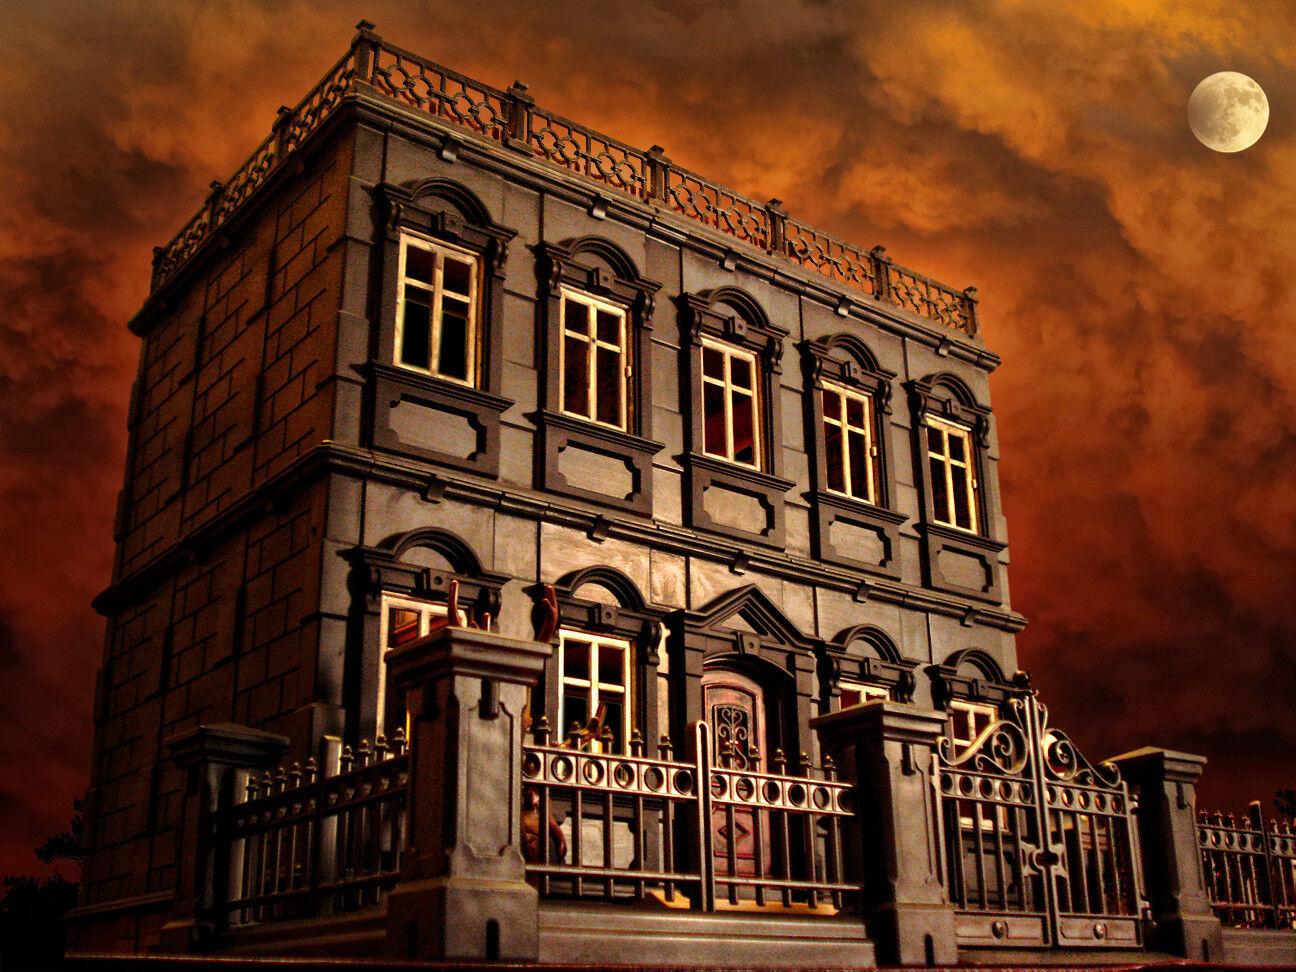 Playmobil Haunted Htuttioween Victorian Gothic uomosion 5300 custom house  80 pcs  economico e di alta qualità